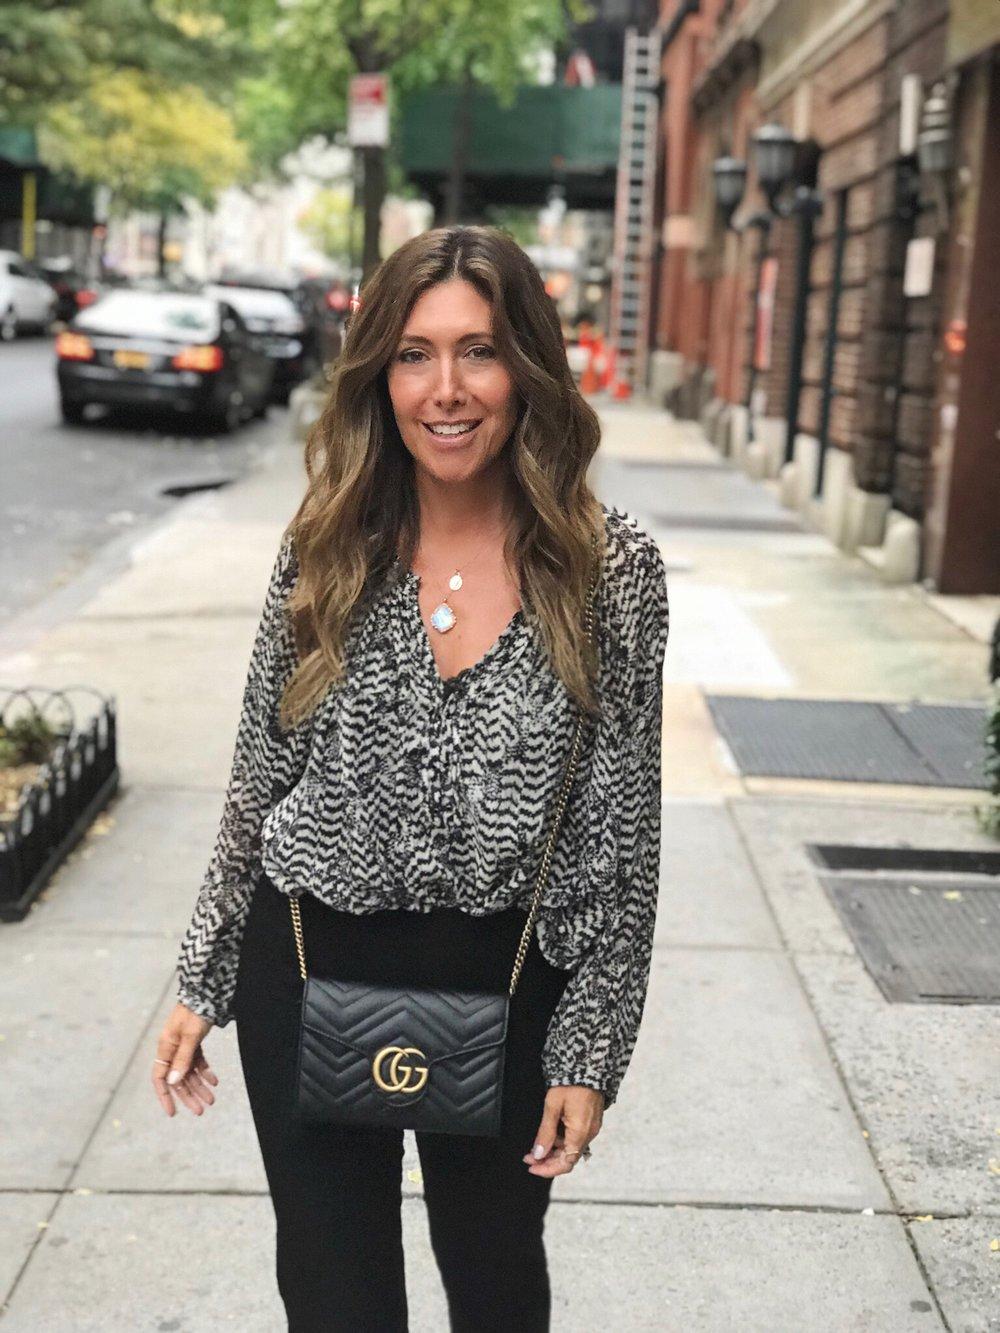 Melissa Meyers Black Bag